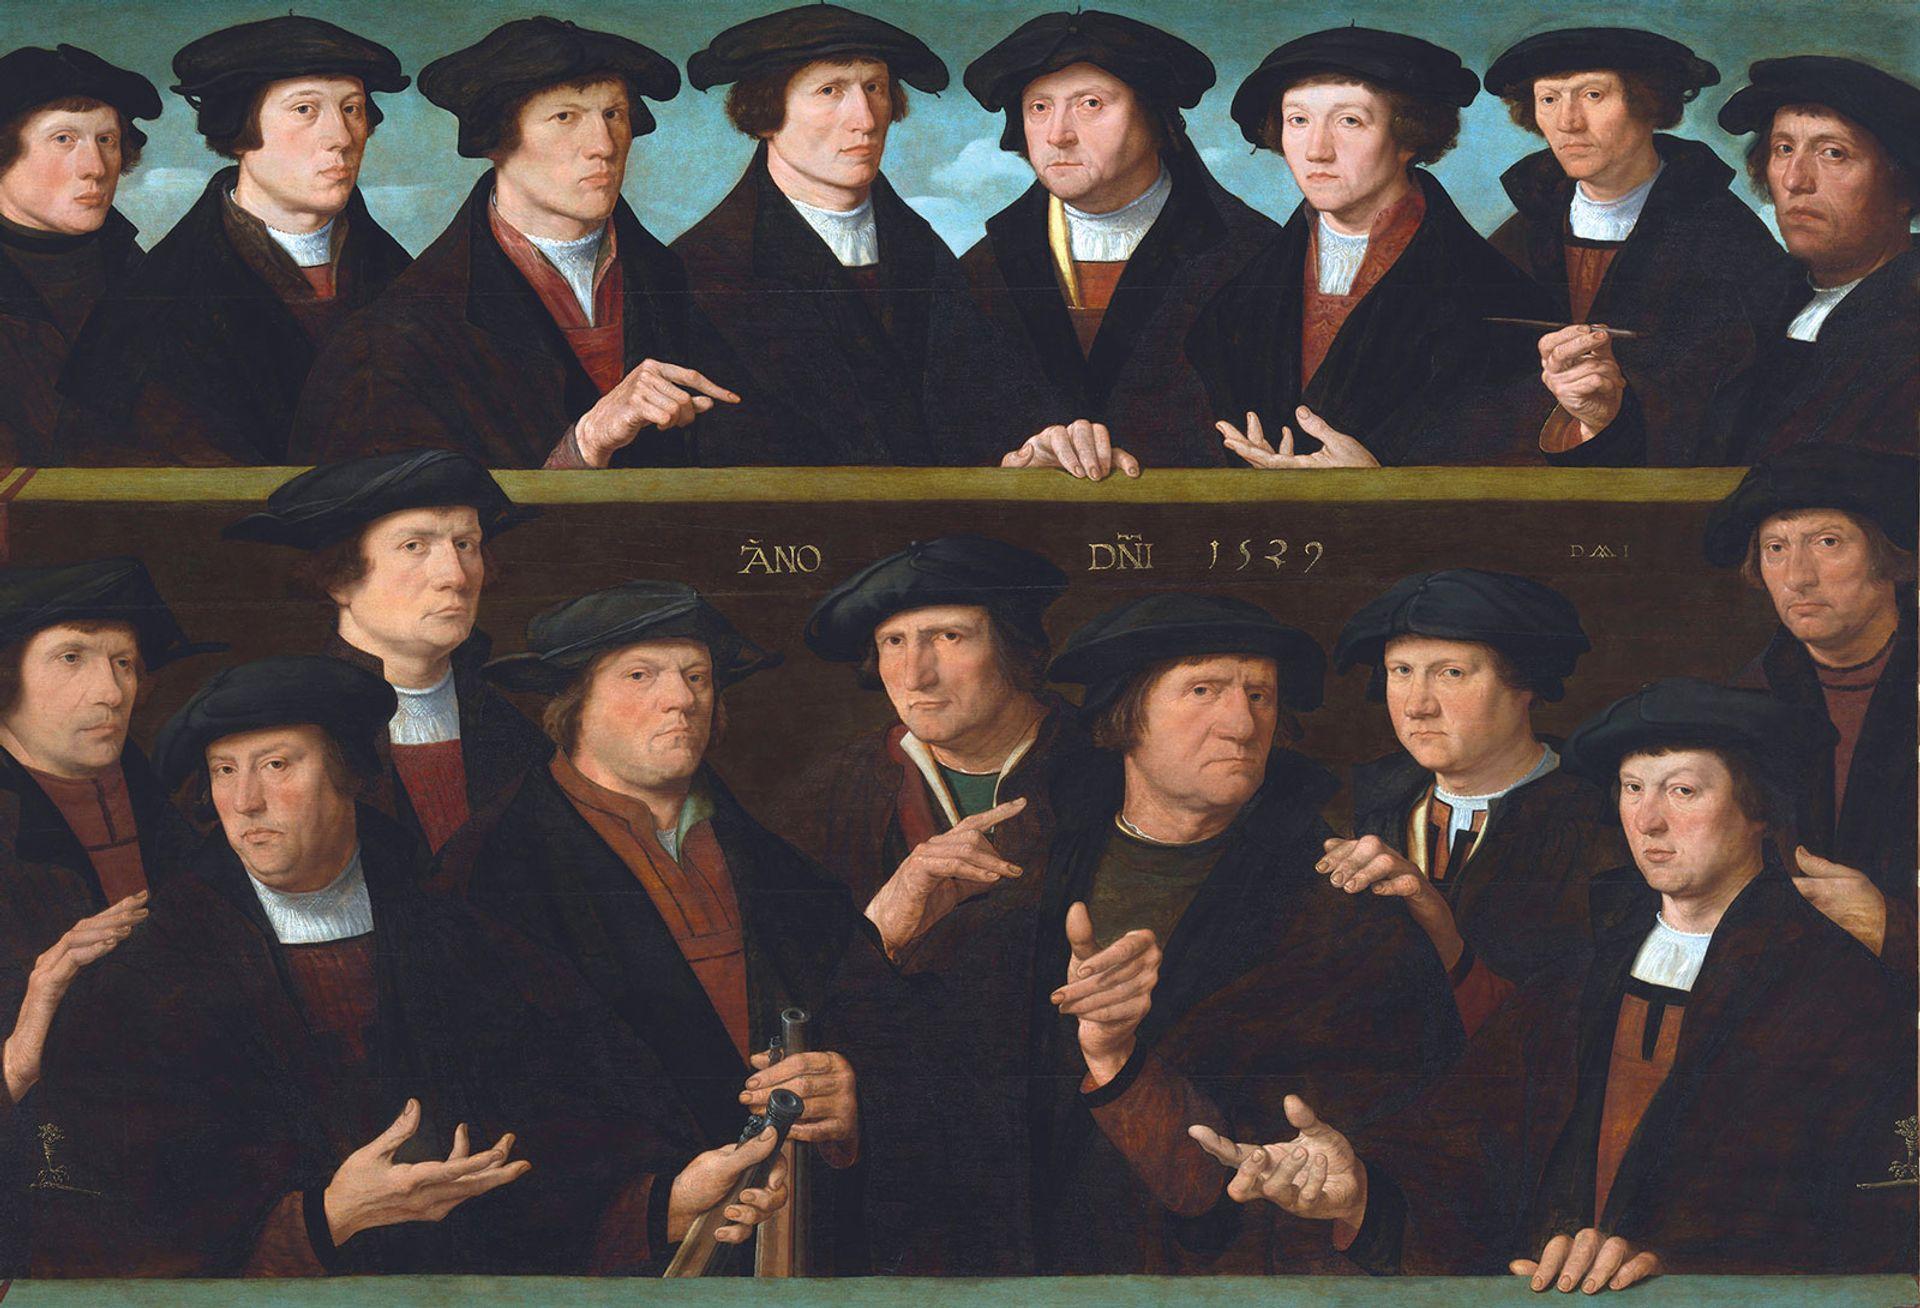 The newly restored Seventeen Guardsmen of the Amsterdam Kloveniersdoelen (Headquarters of the Arquebusiers' Civic Guard) (1529) by Dirck Jacobsz Jacobsz: Courtesy of the Rijksmuseum, Amsterdam